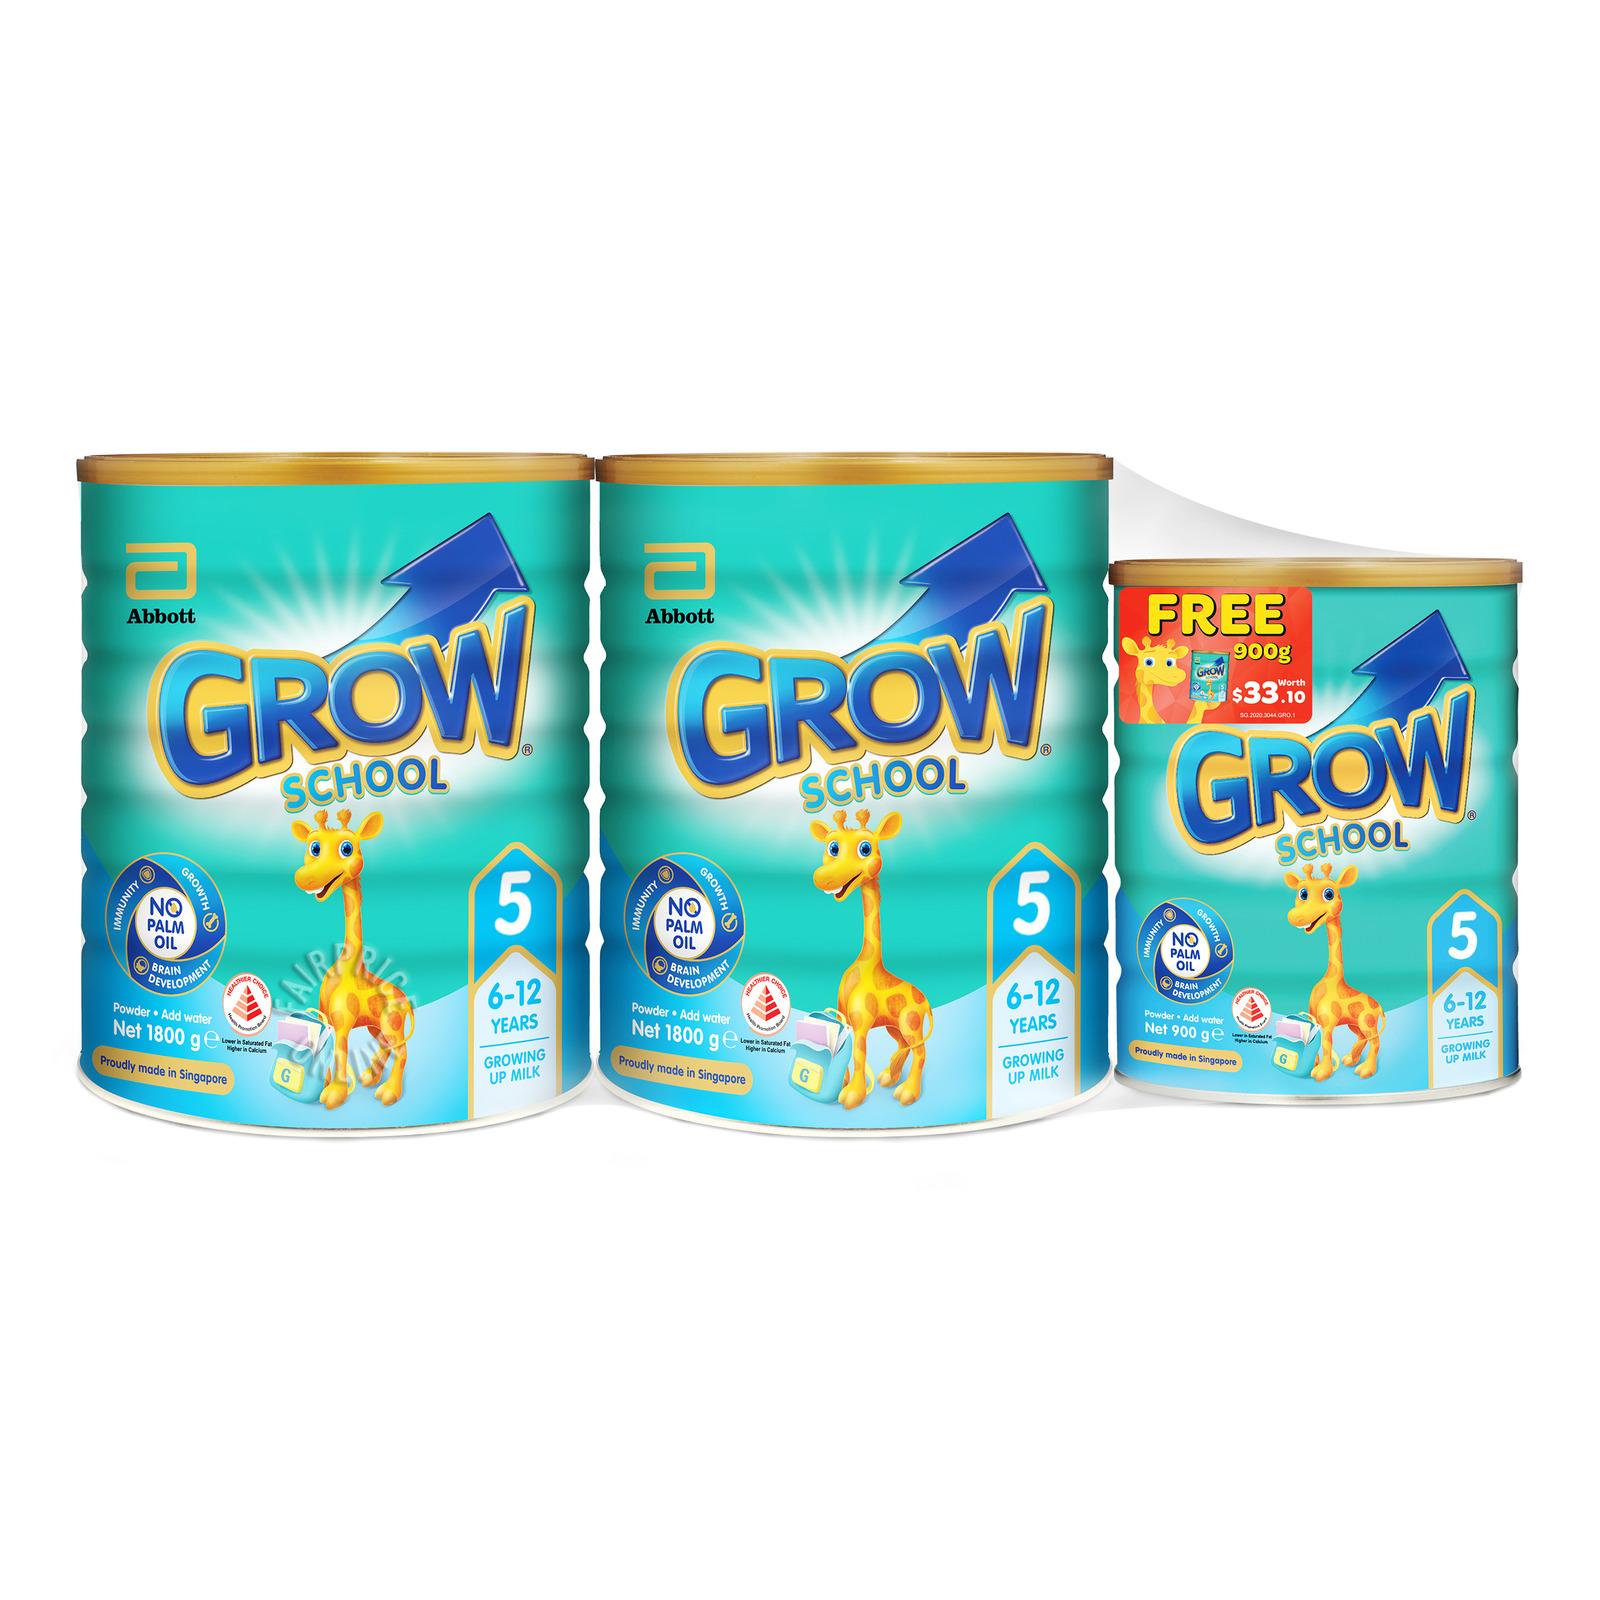 Abbott Grow School Milk Formula - 6 Years Onward